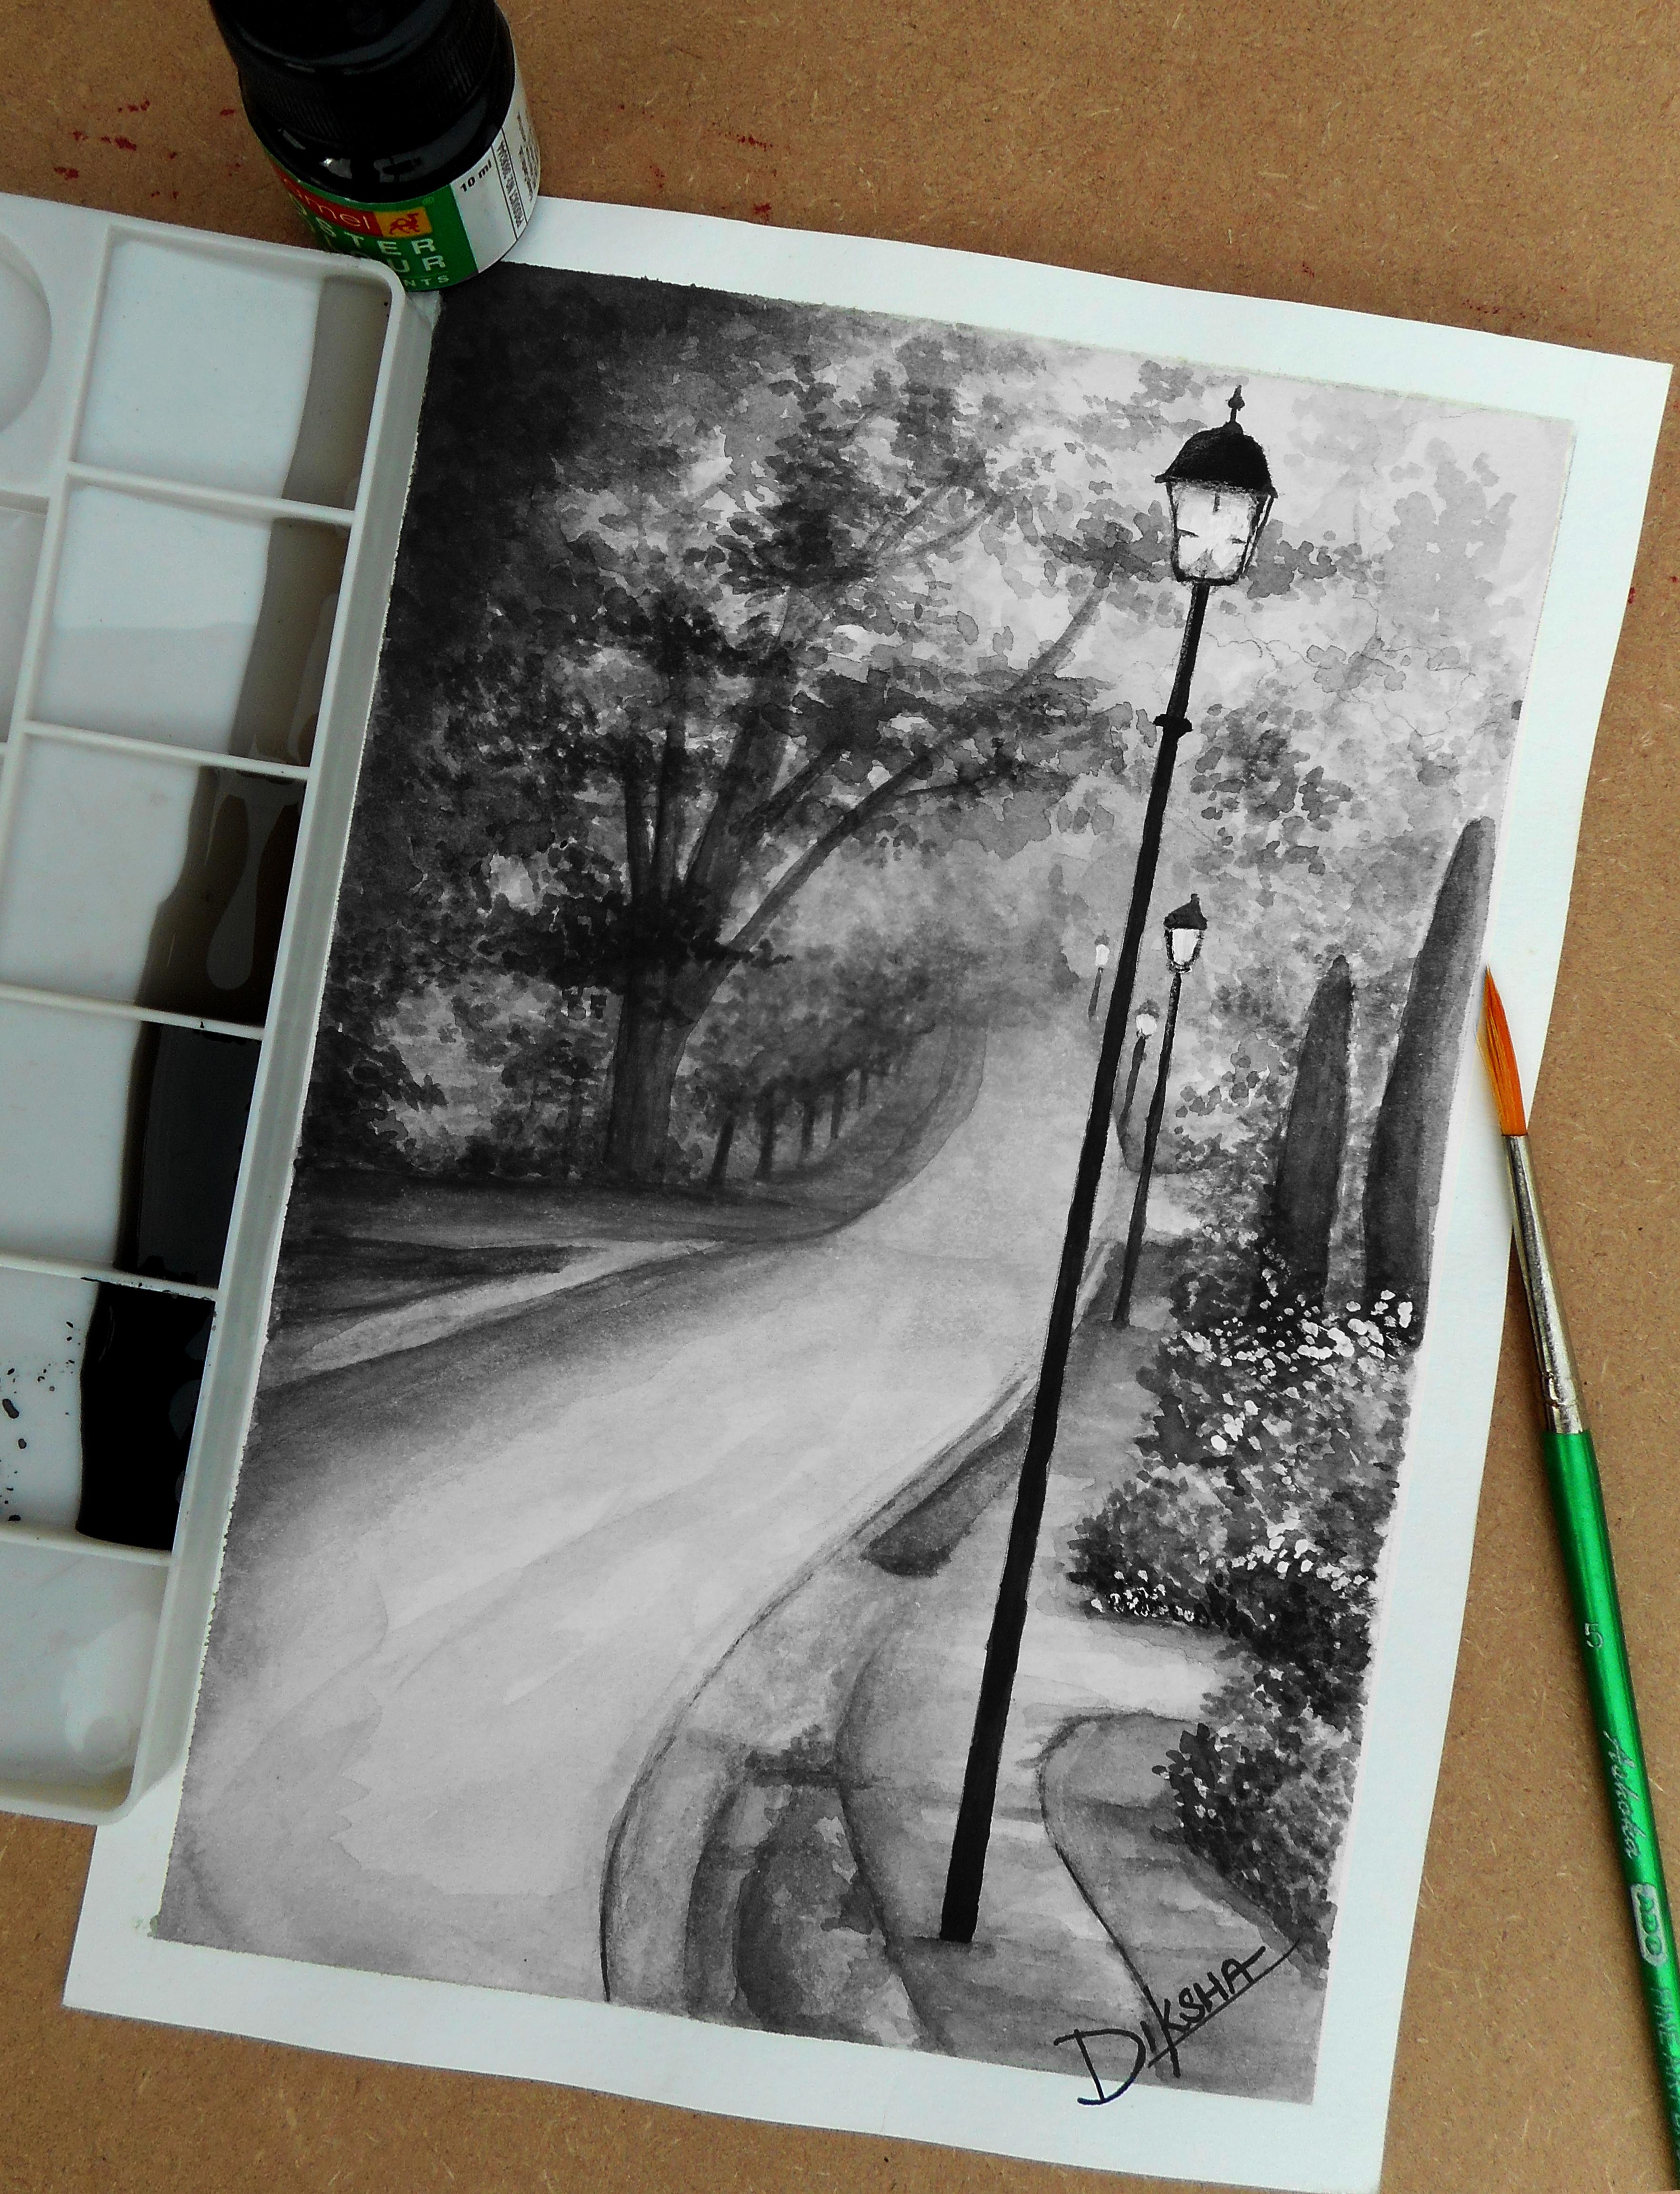 Mist in the Night by Diksha13